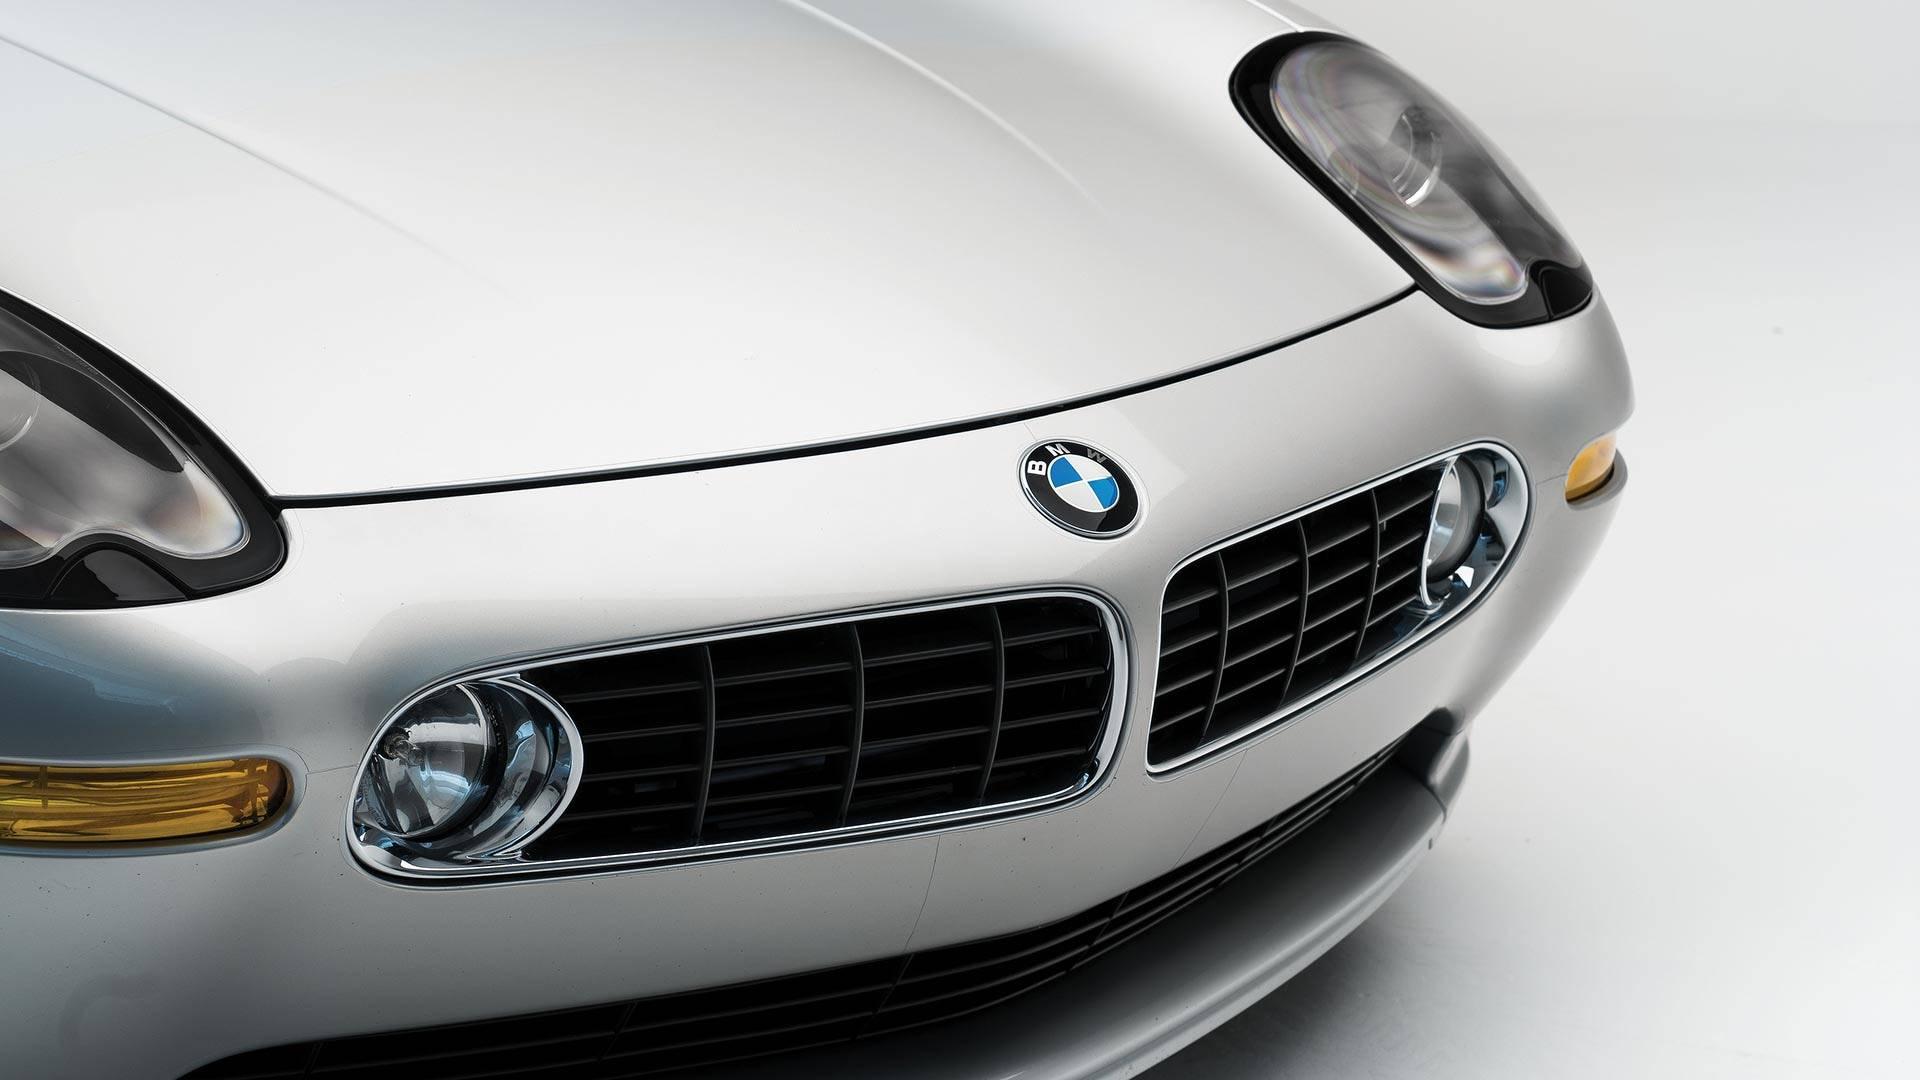 Steve_Jobs_2000_BMW_Z8_auction_0007